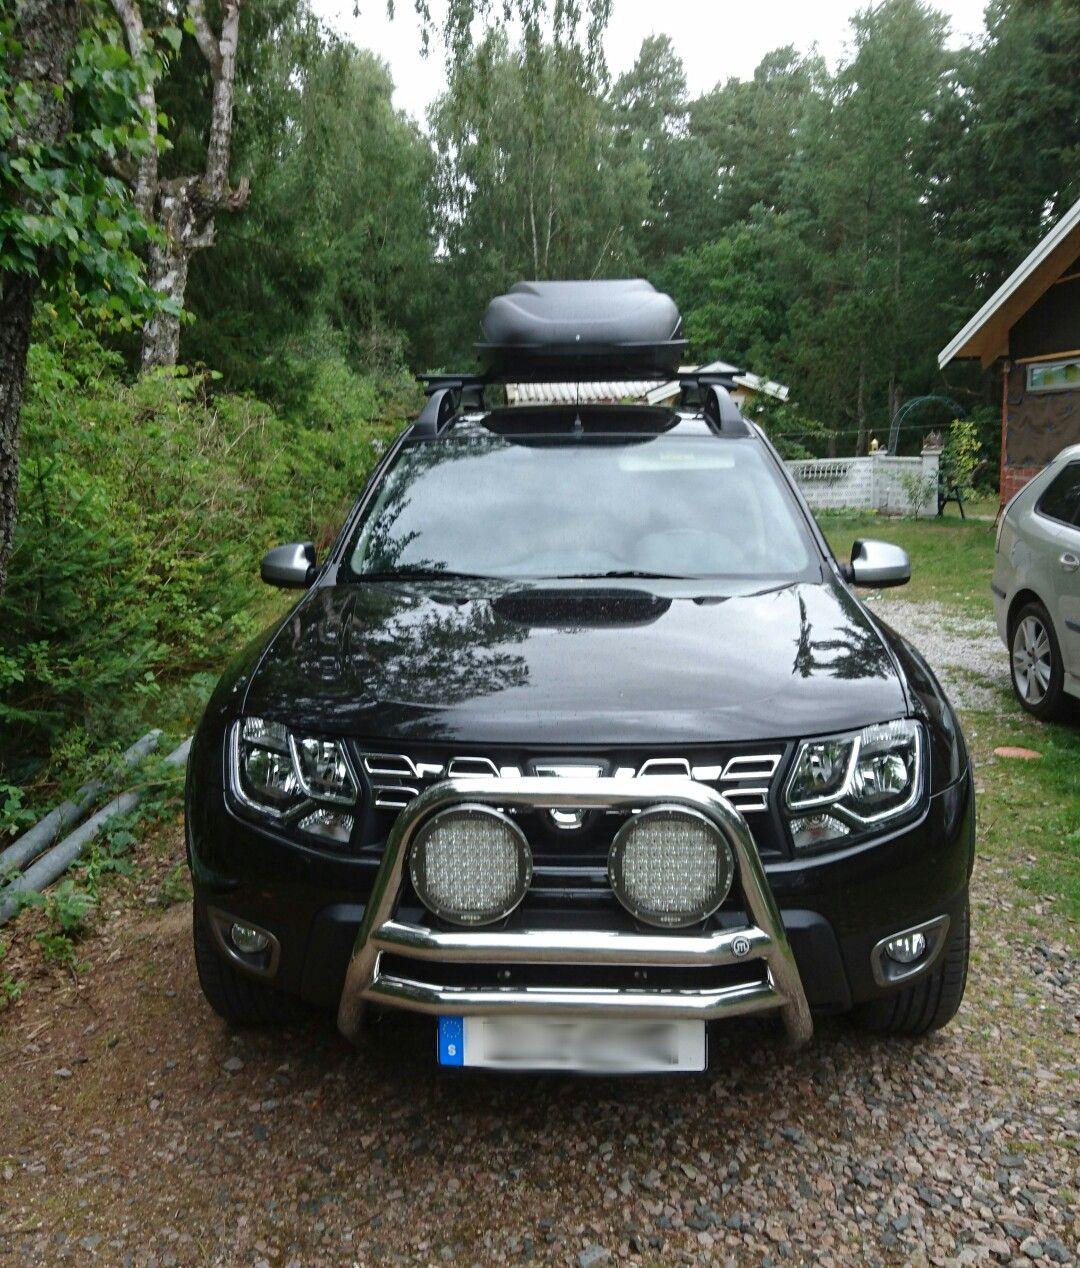 Hermes Web Track >> Dacia Duster 4x4 Adventure Roofbox   Dacia Duster   Pinterest